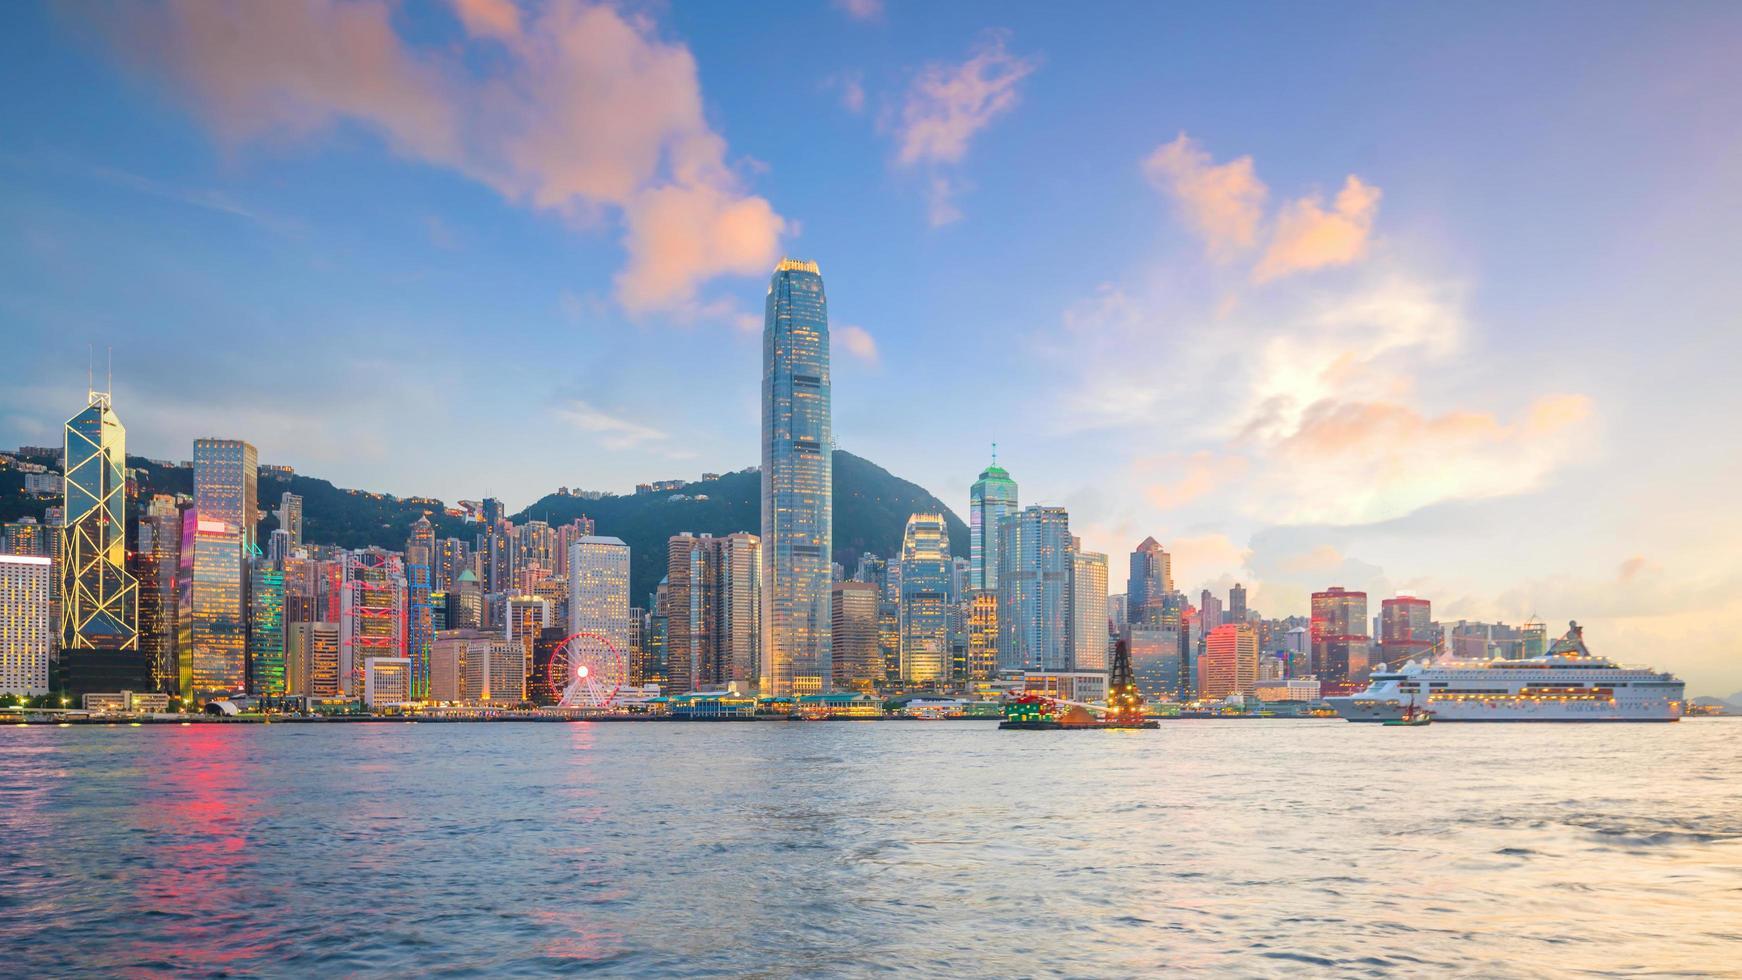 Hong Kong skyline photo